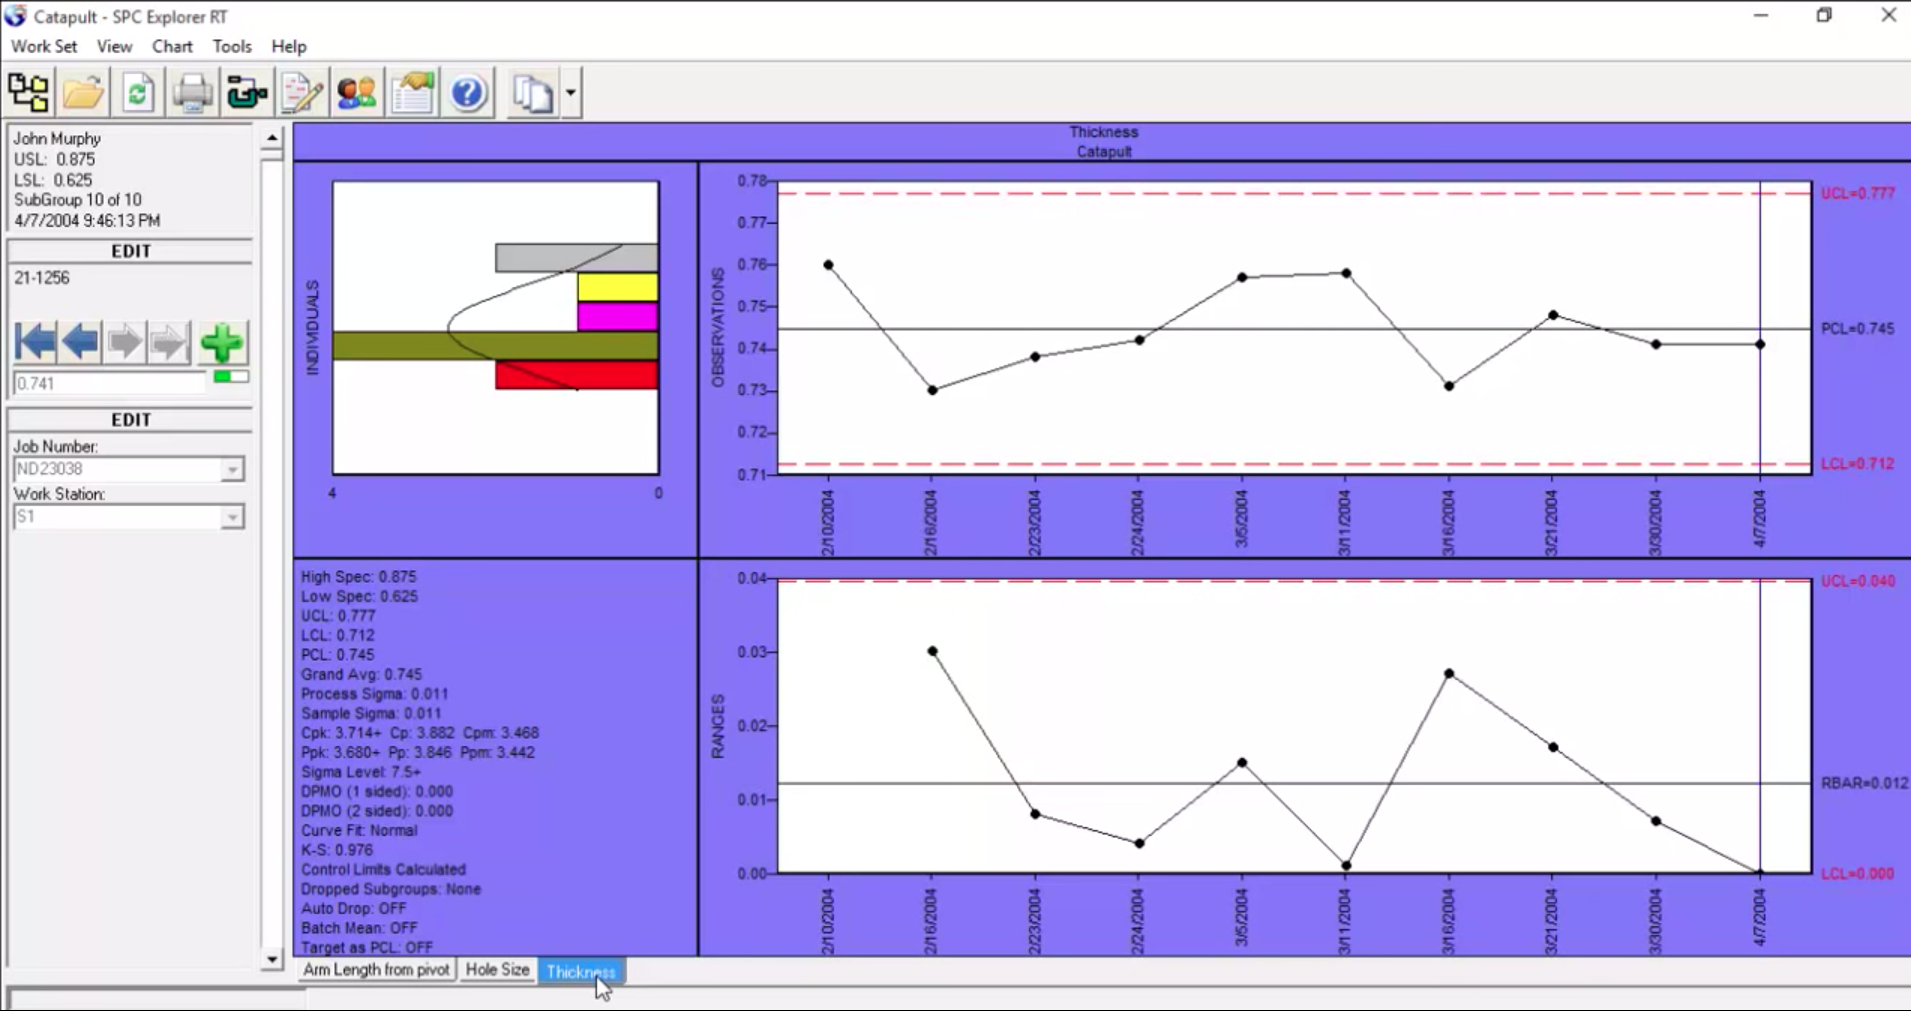 SPC-PC IV Explorer sigma chart